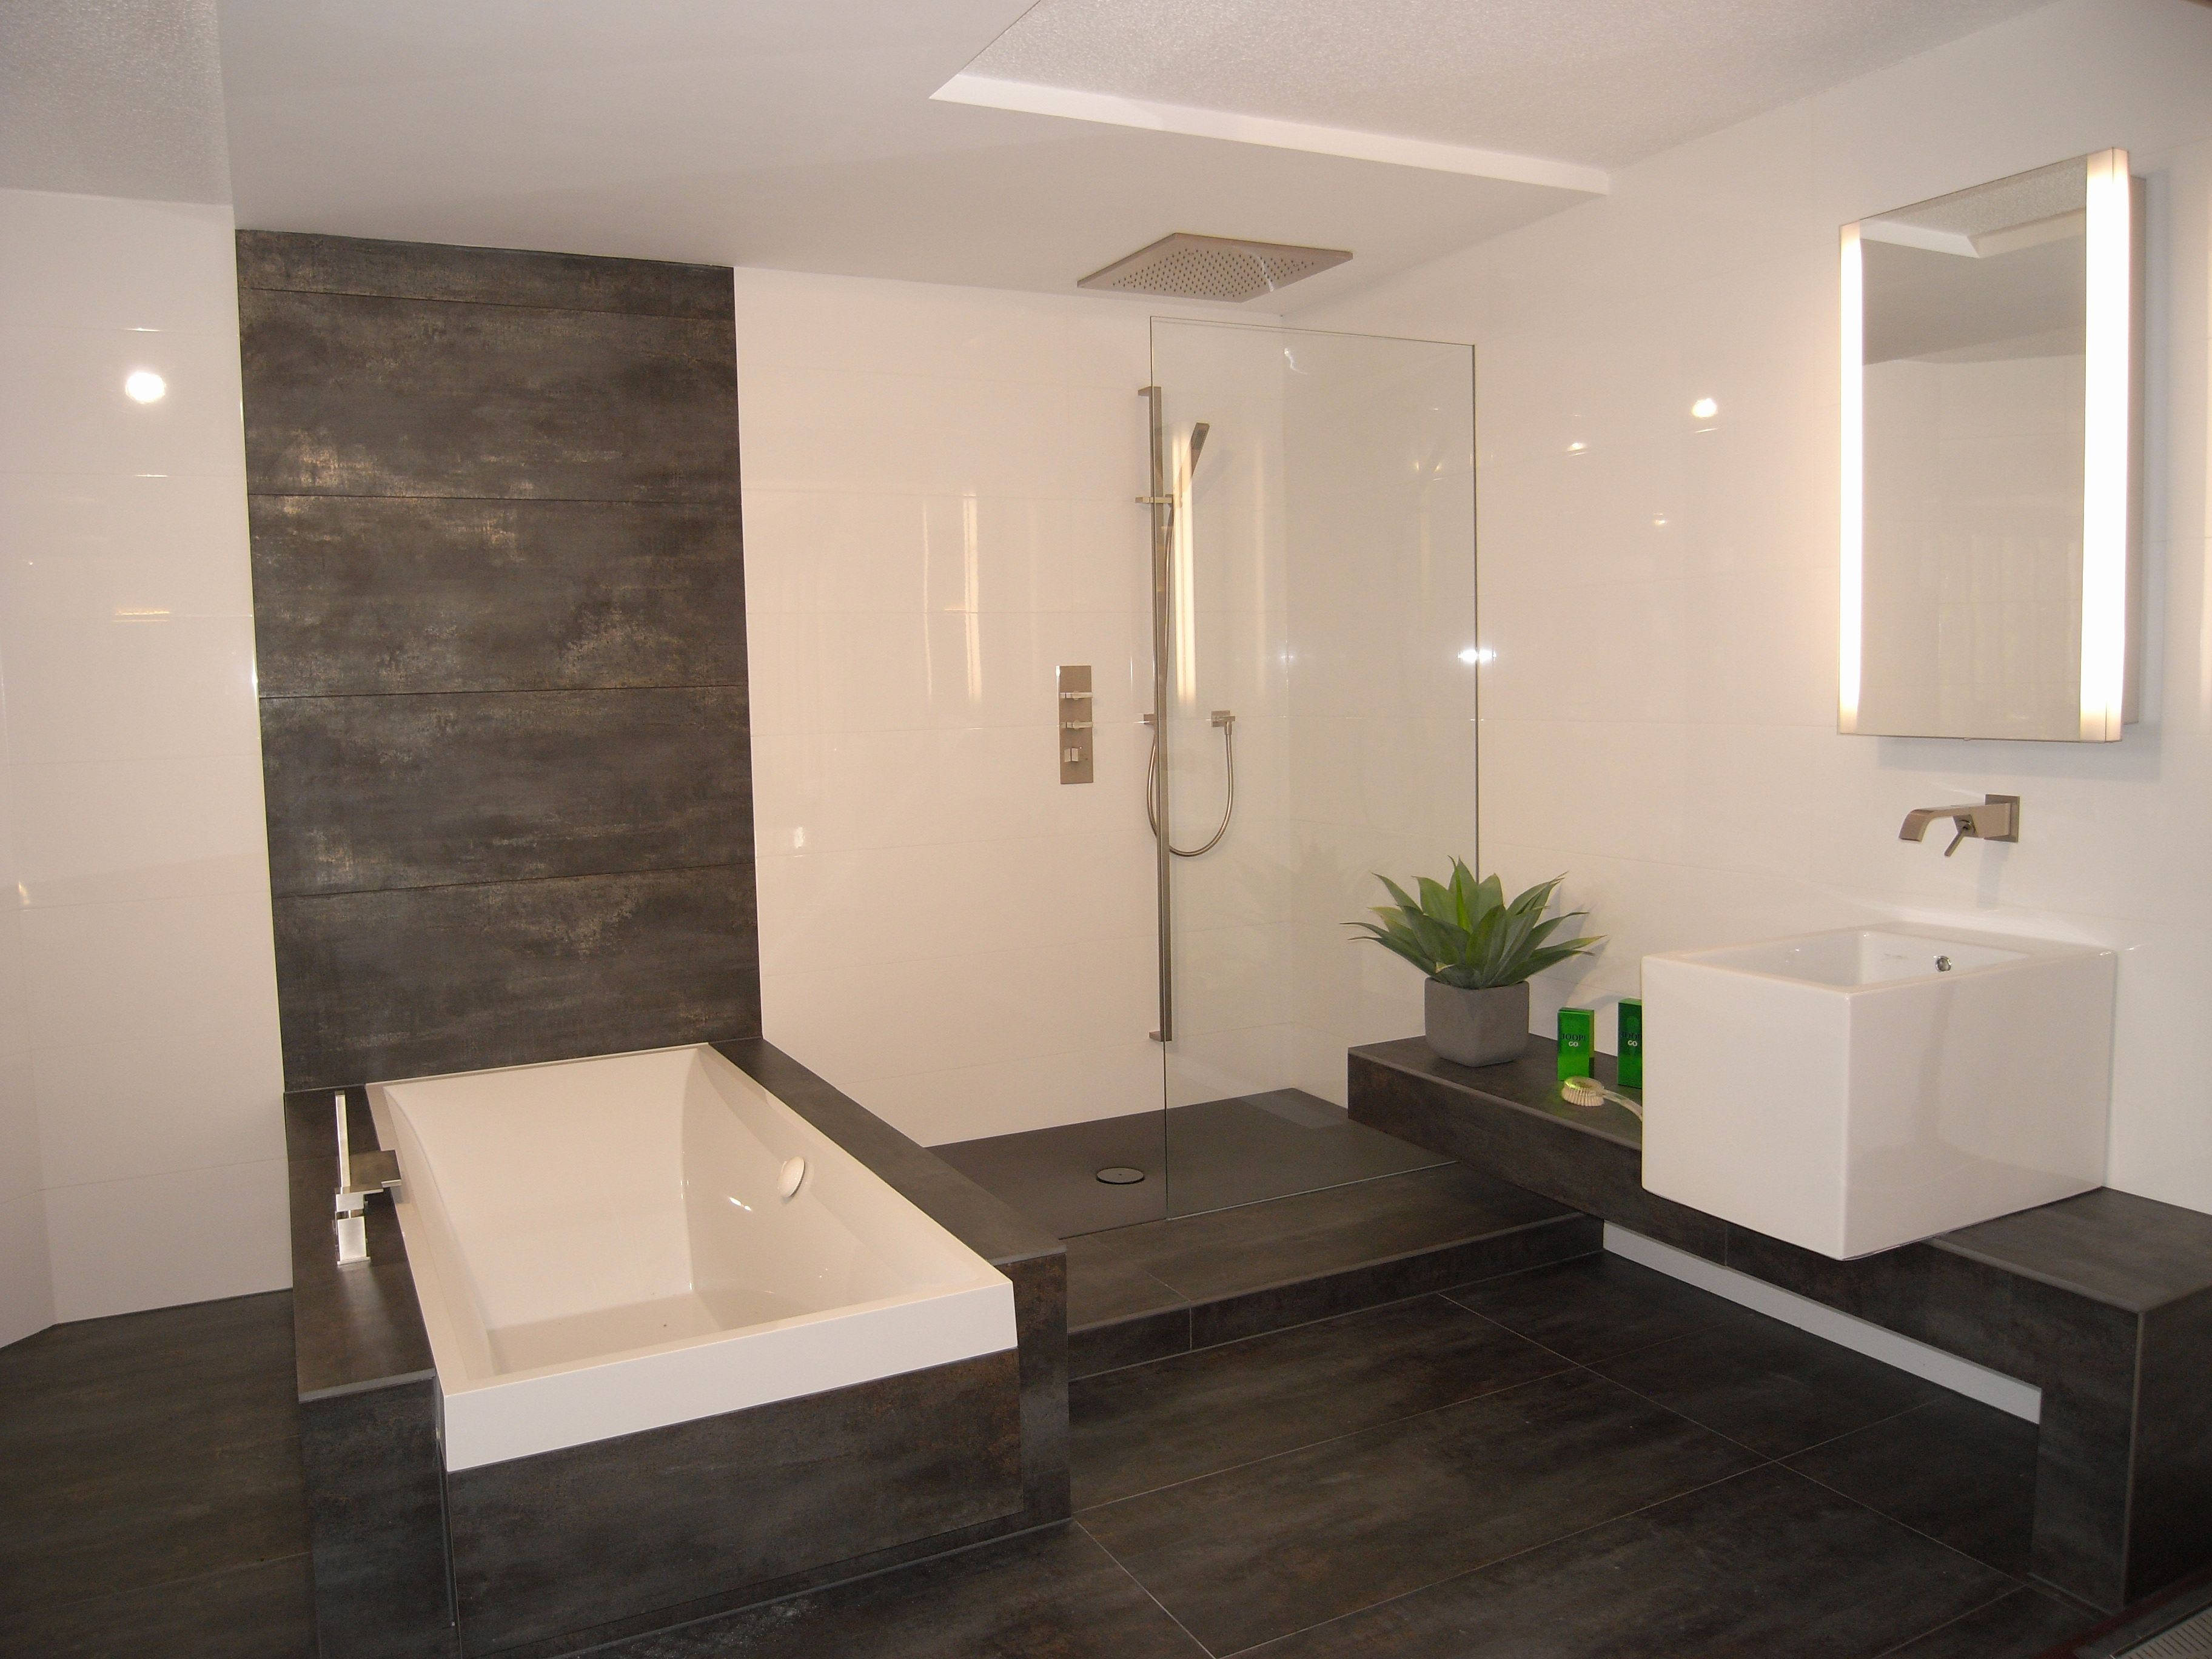 Badezimmer Google Zoeken Badezimmer Badezimmer Fliesen Moderne Dusche